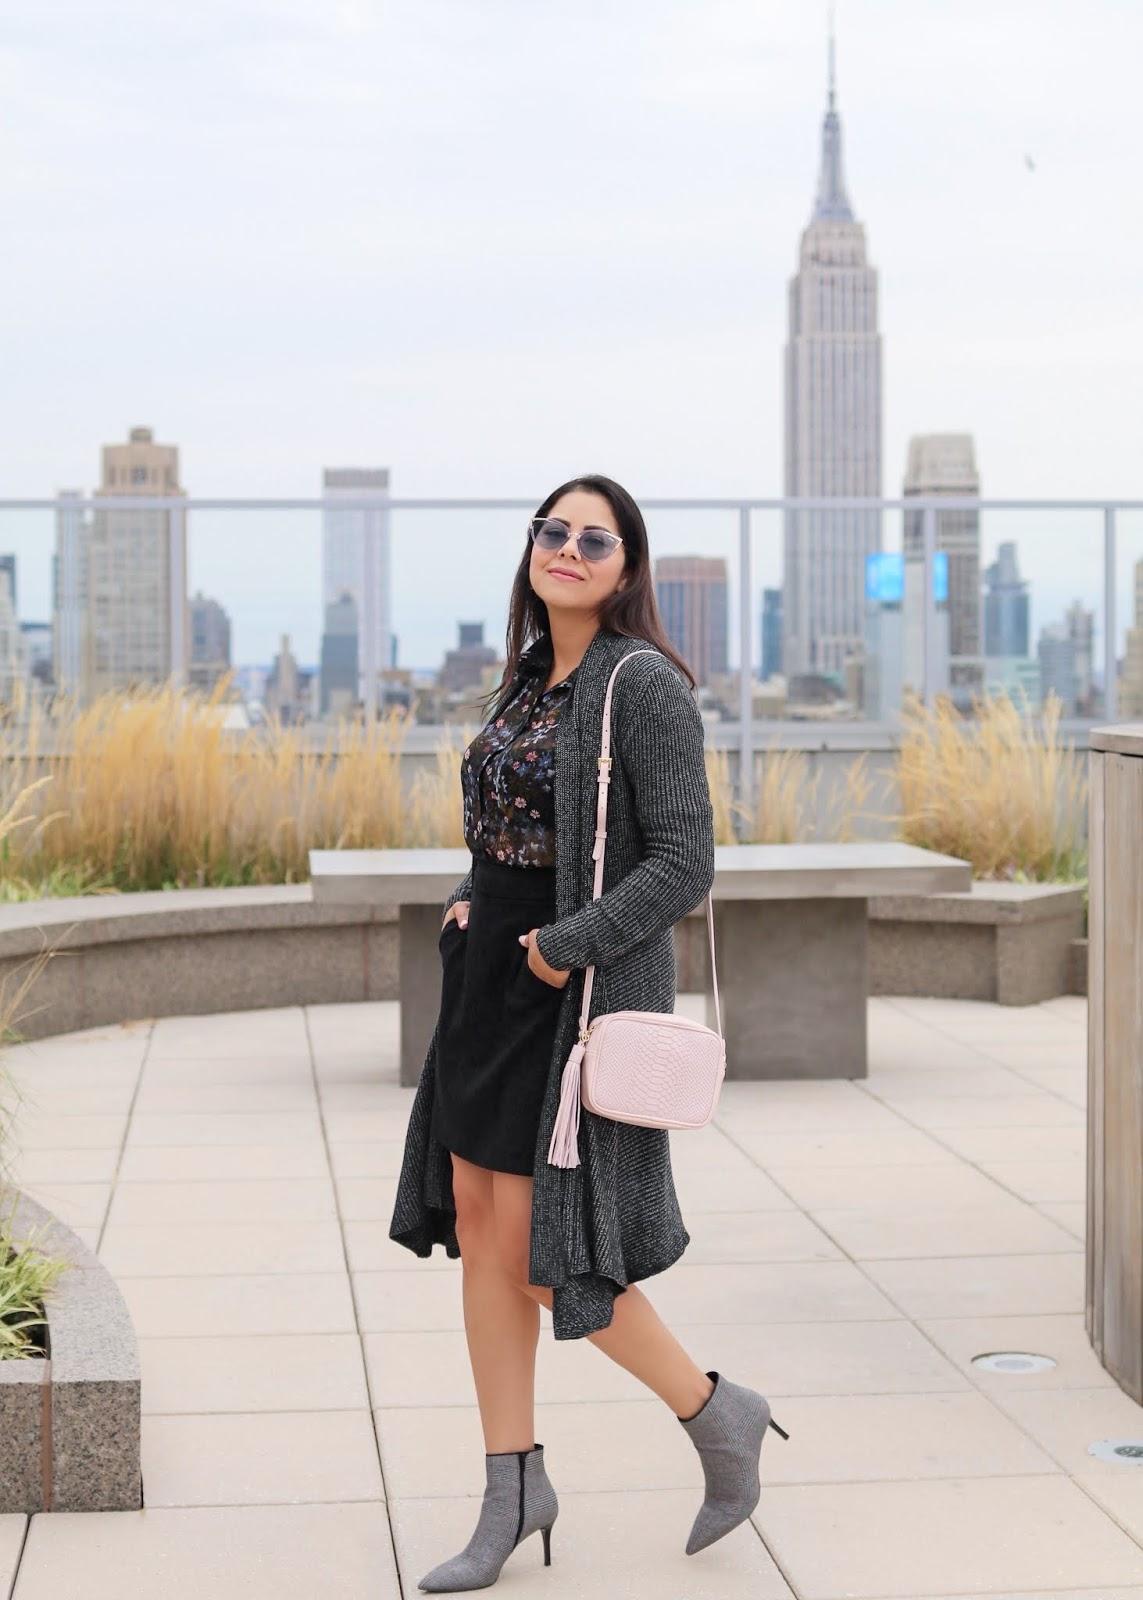 walking into fall 2018 like, quay cateye sunglasses